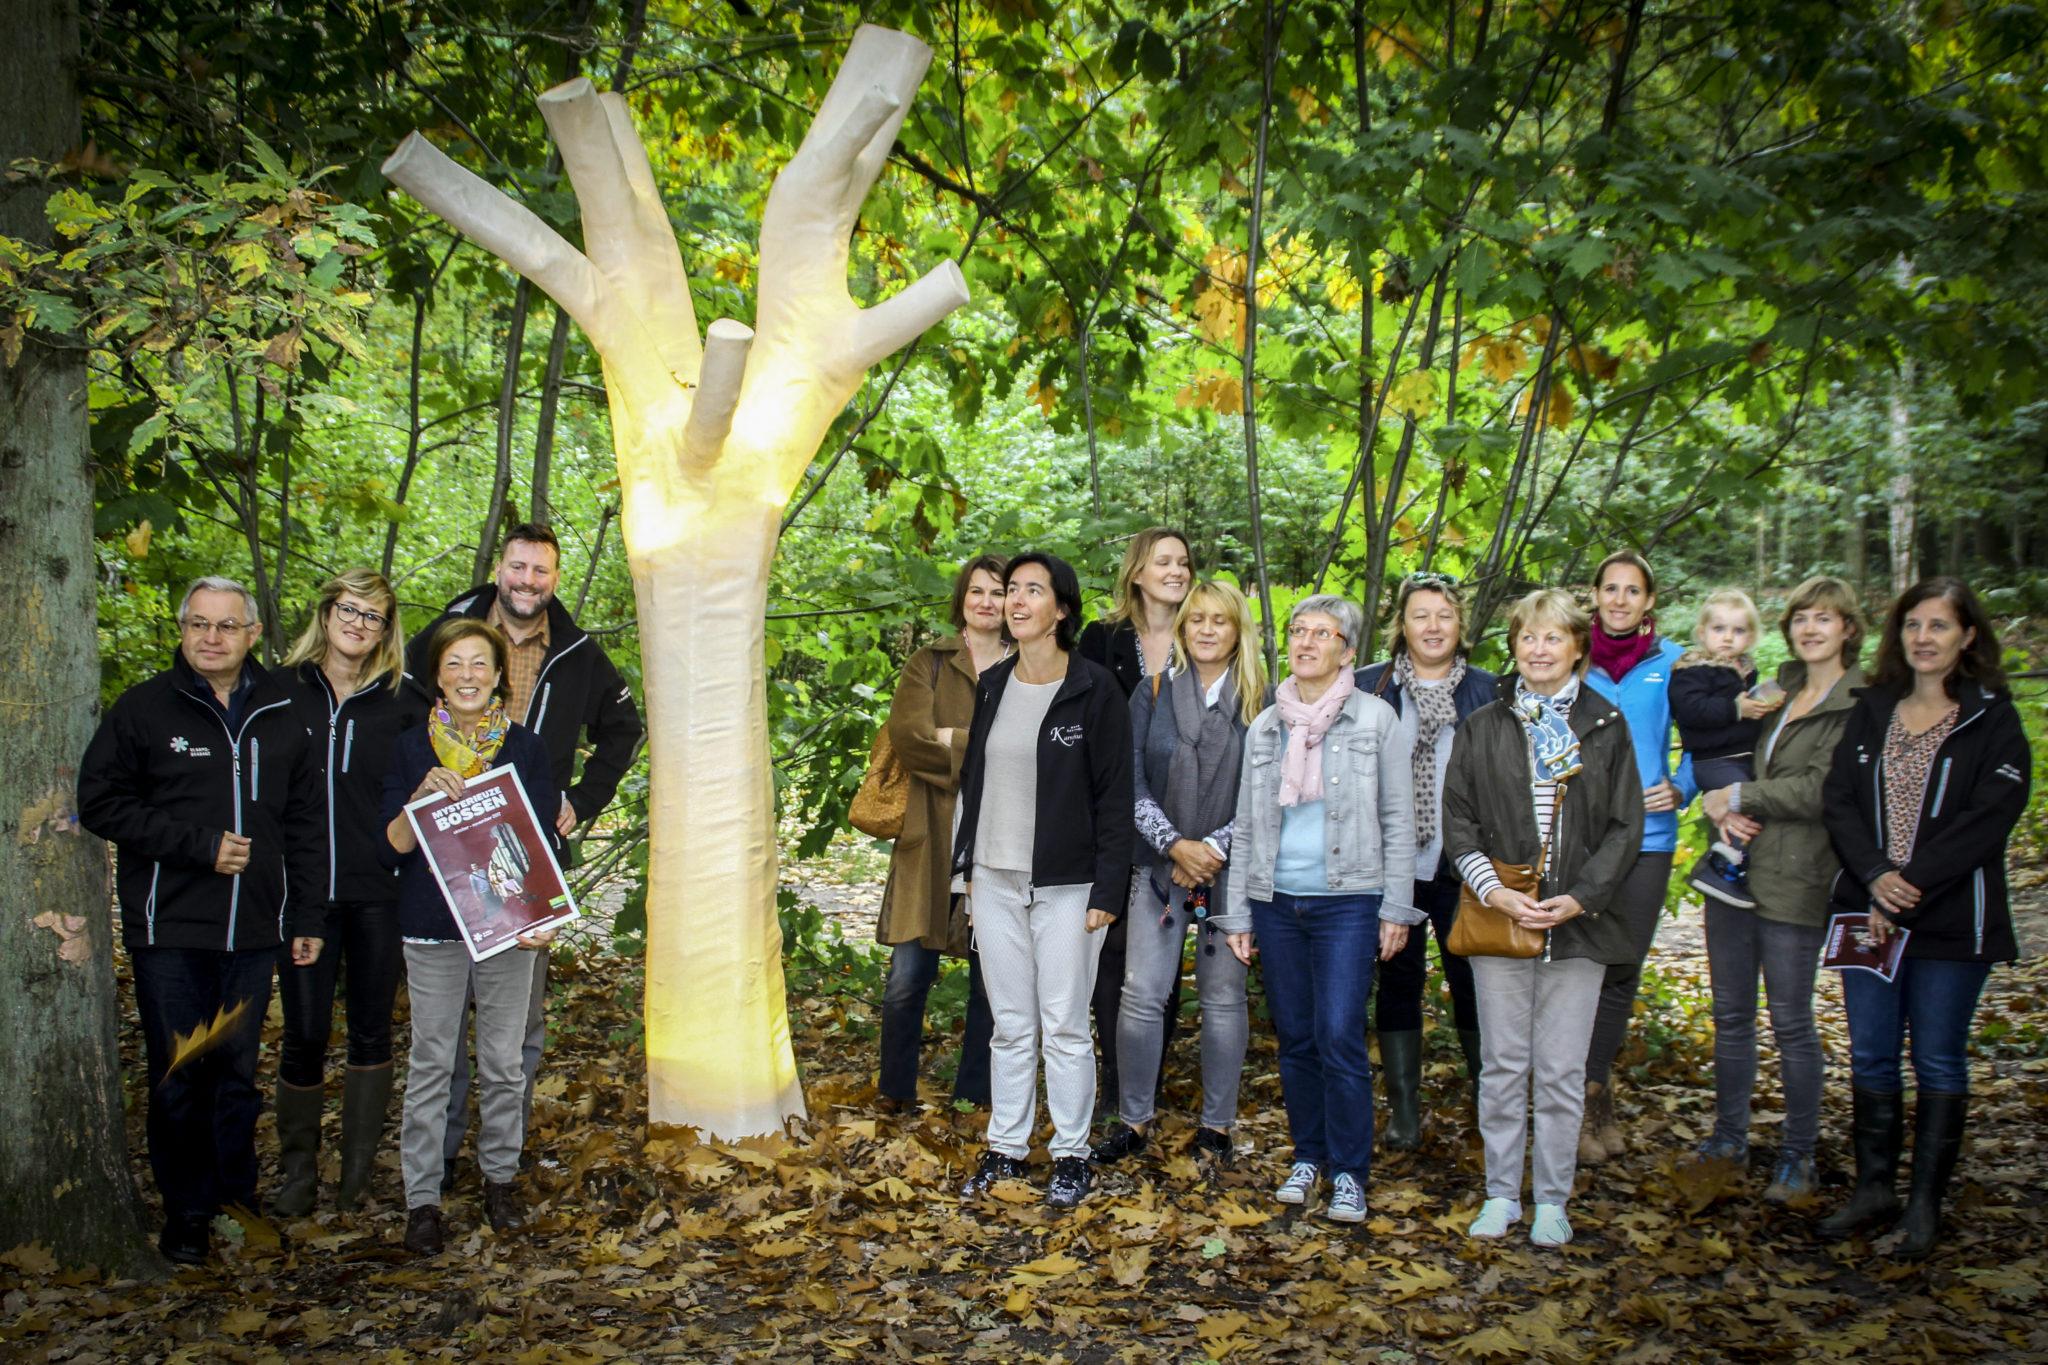 Toerisme Vlaams-Brabant lokt publiek naar mysterieuze bossen.